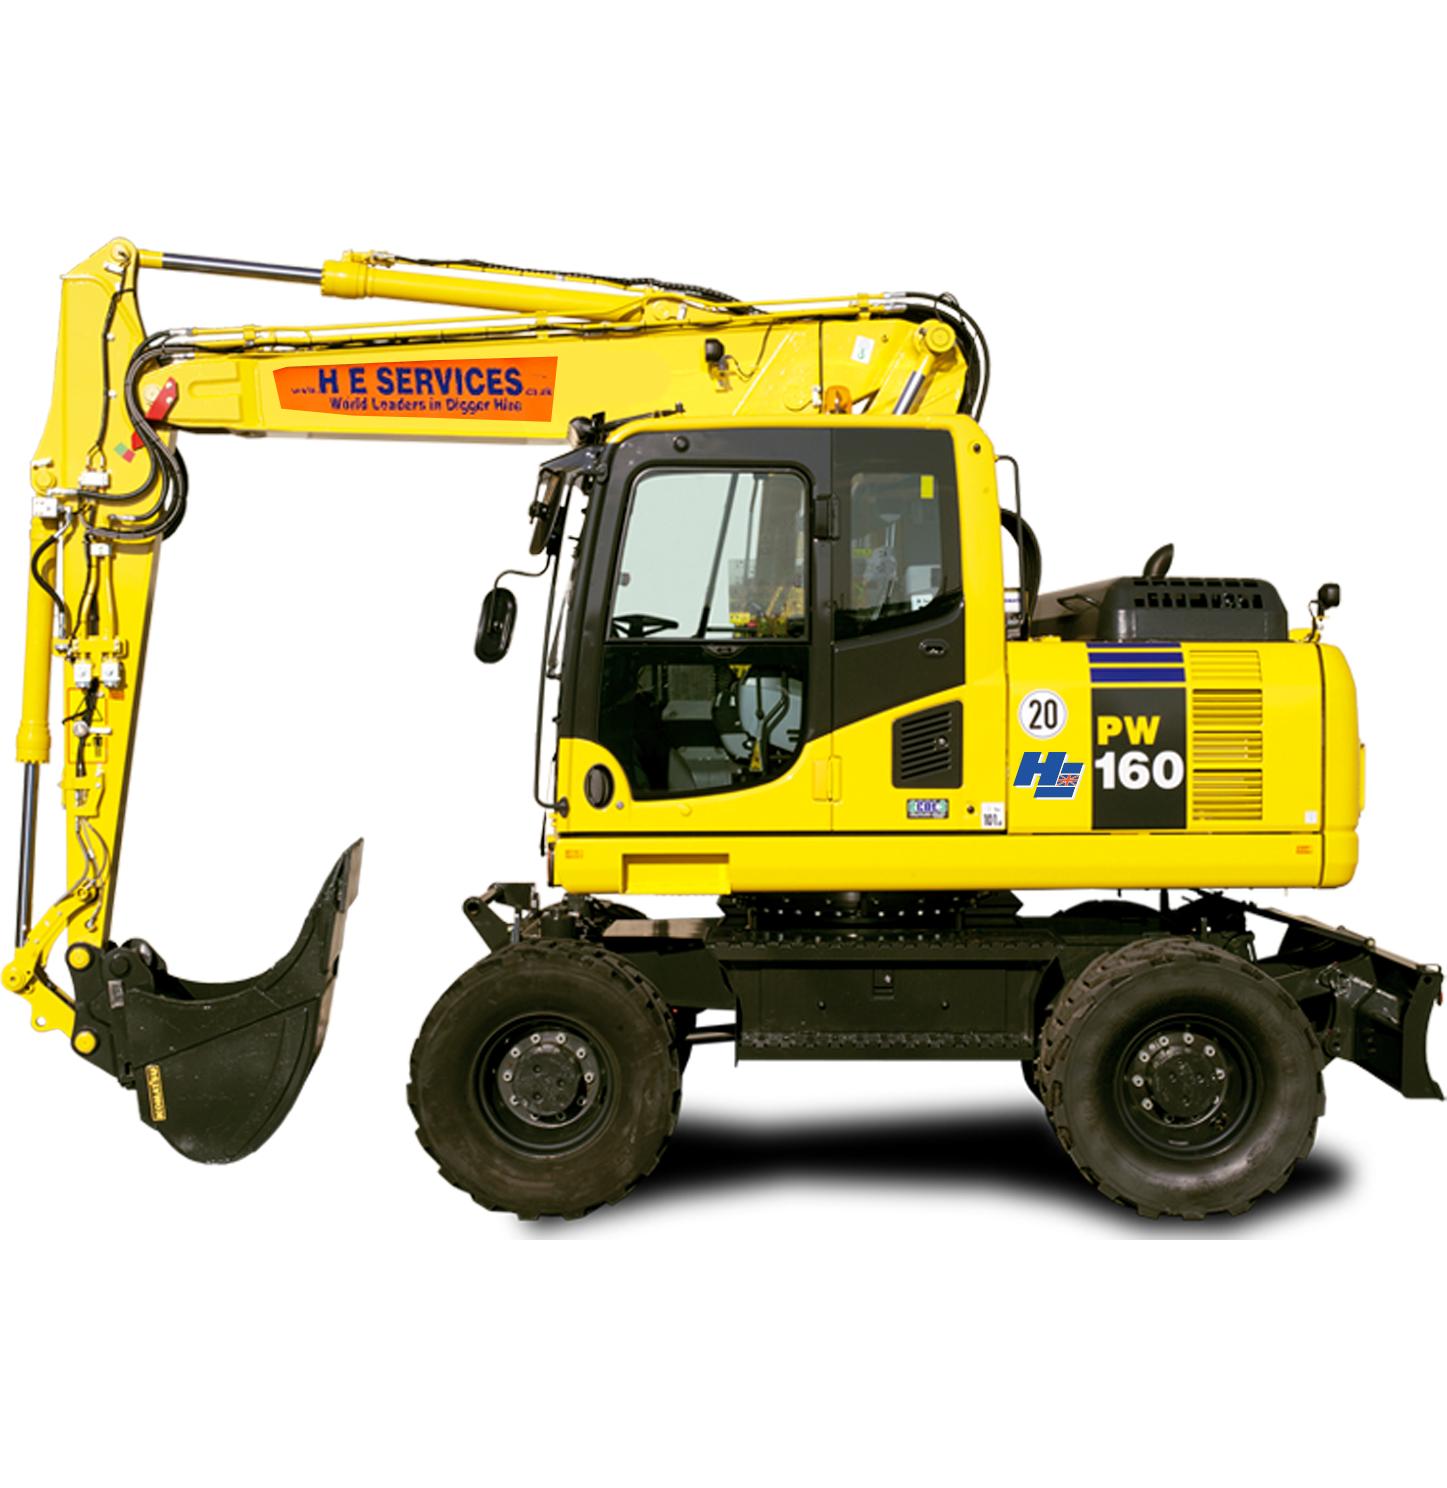 2 Piece Boom Komatsu PW160 Wheel Excavator